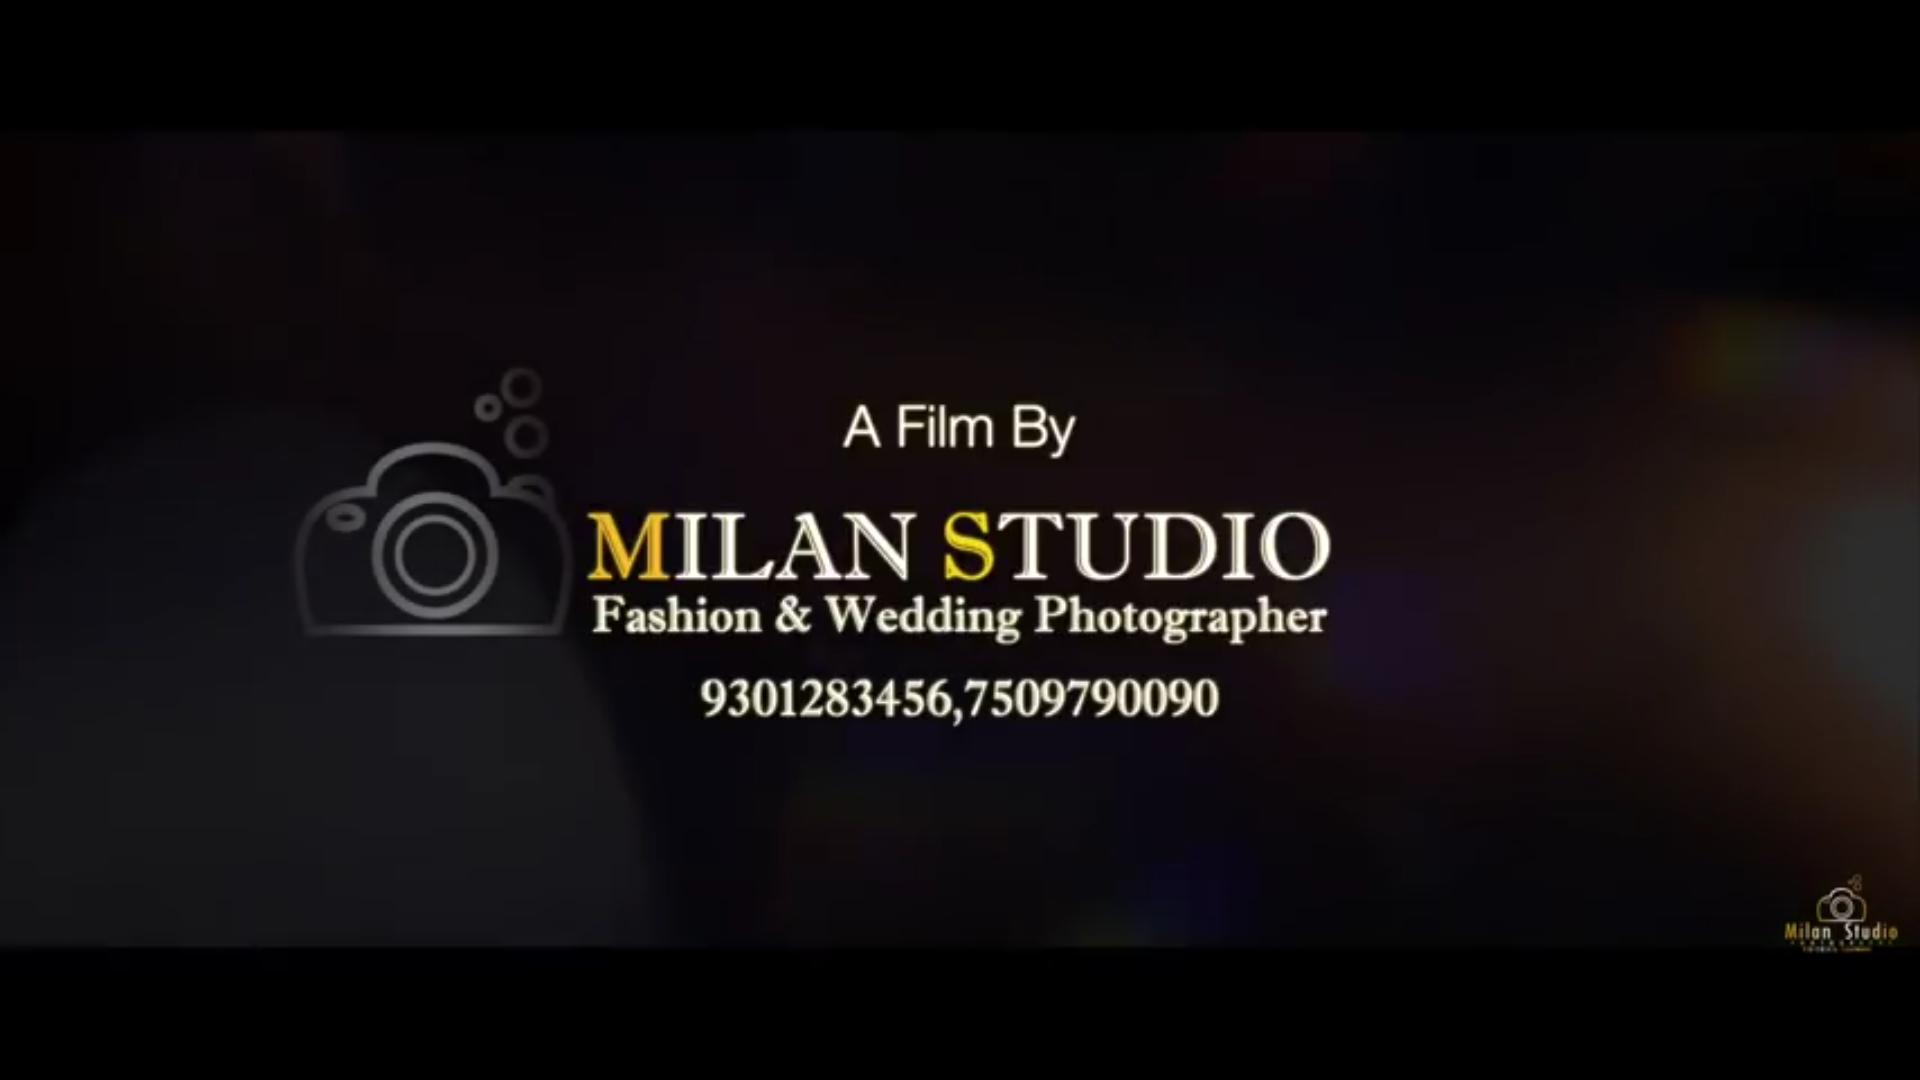 Milan studio.honey photography